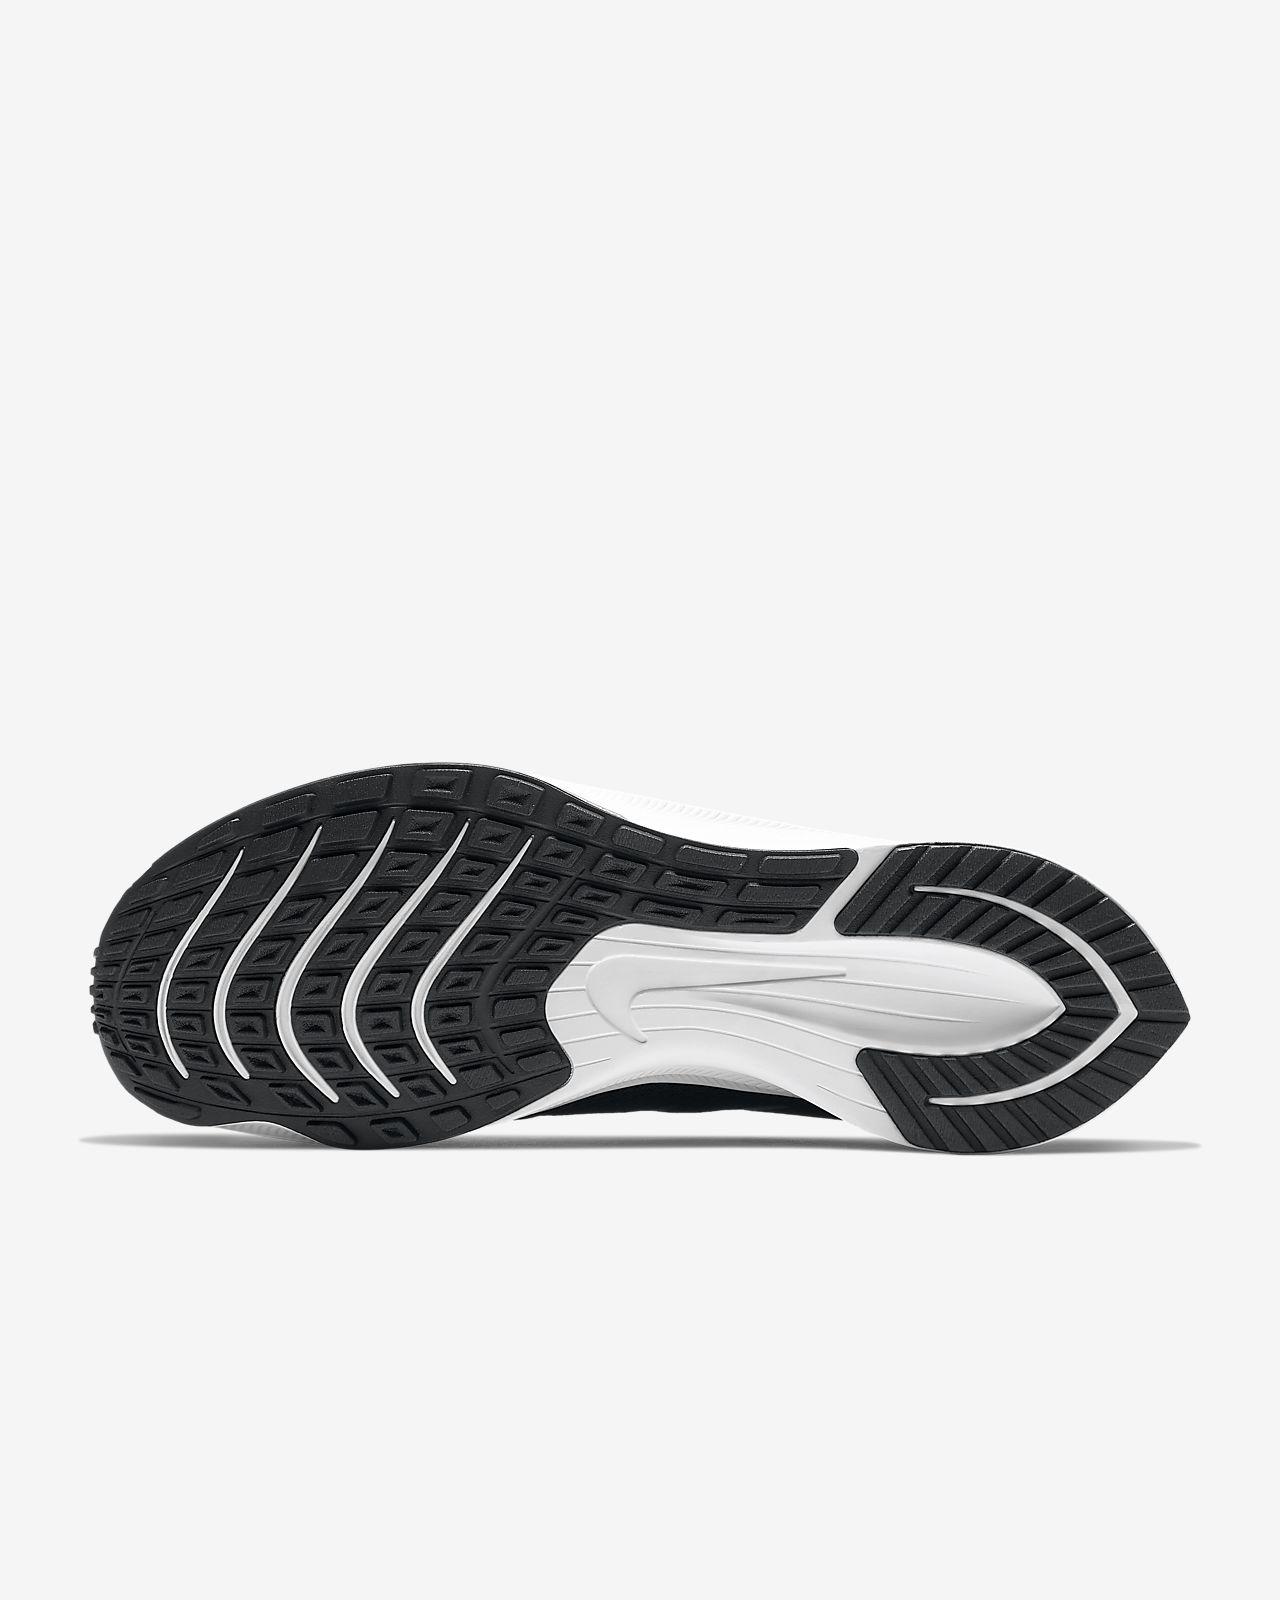 1dedca883682 Nike Zoom Rival Fly Women s Running Shoe. Nike.com SG